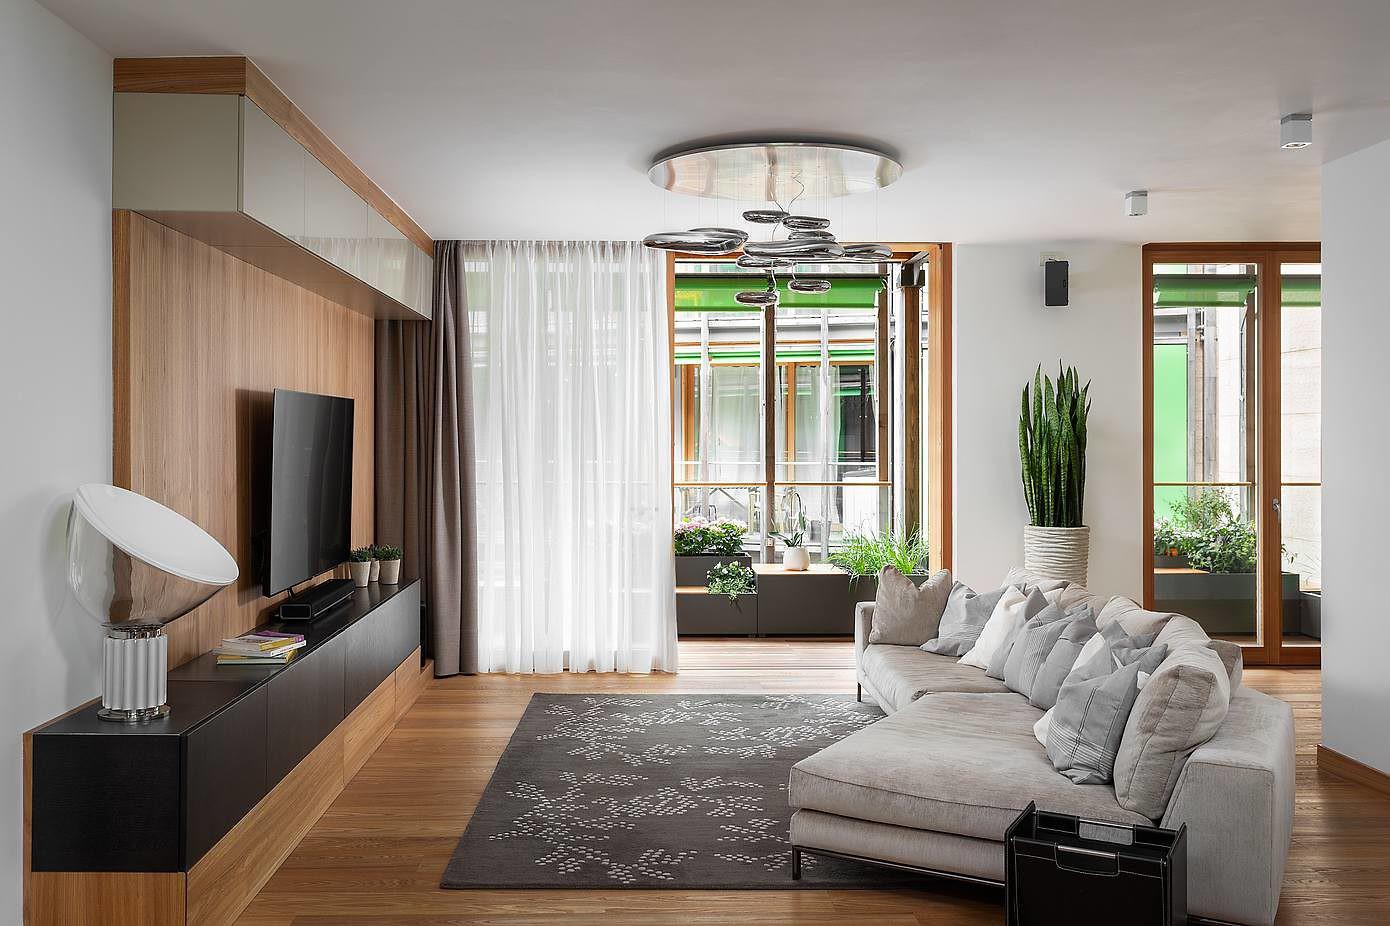 Casa Ian by Stefano Pasquali